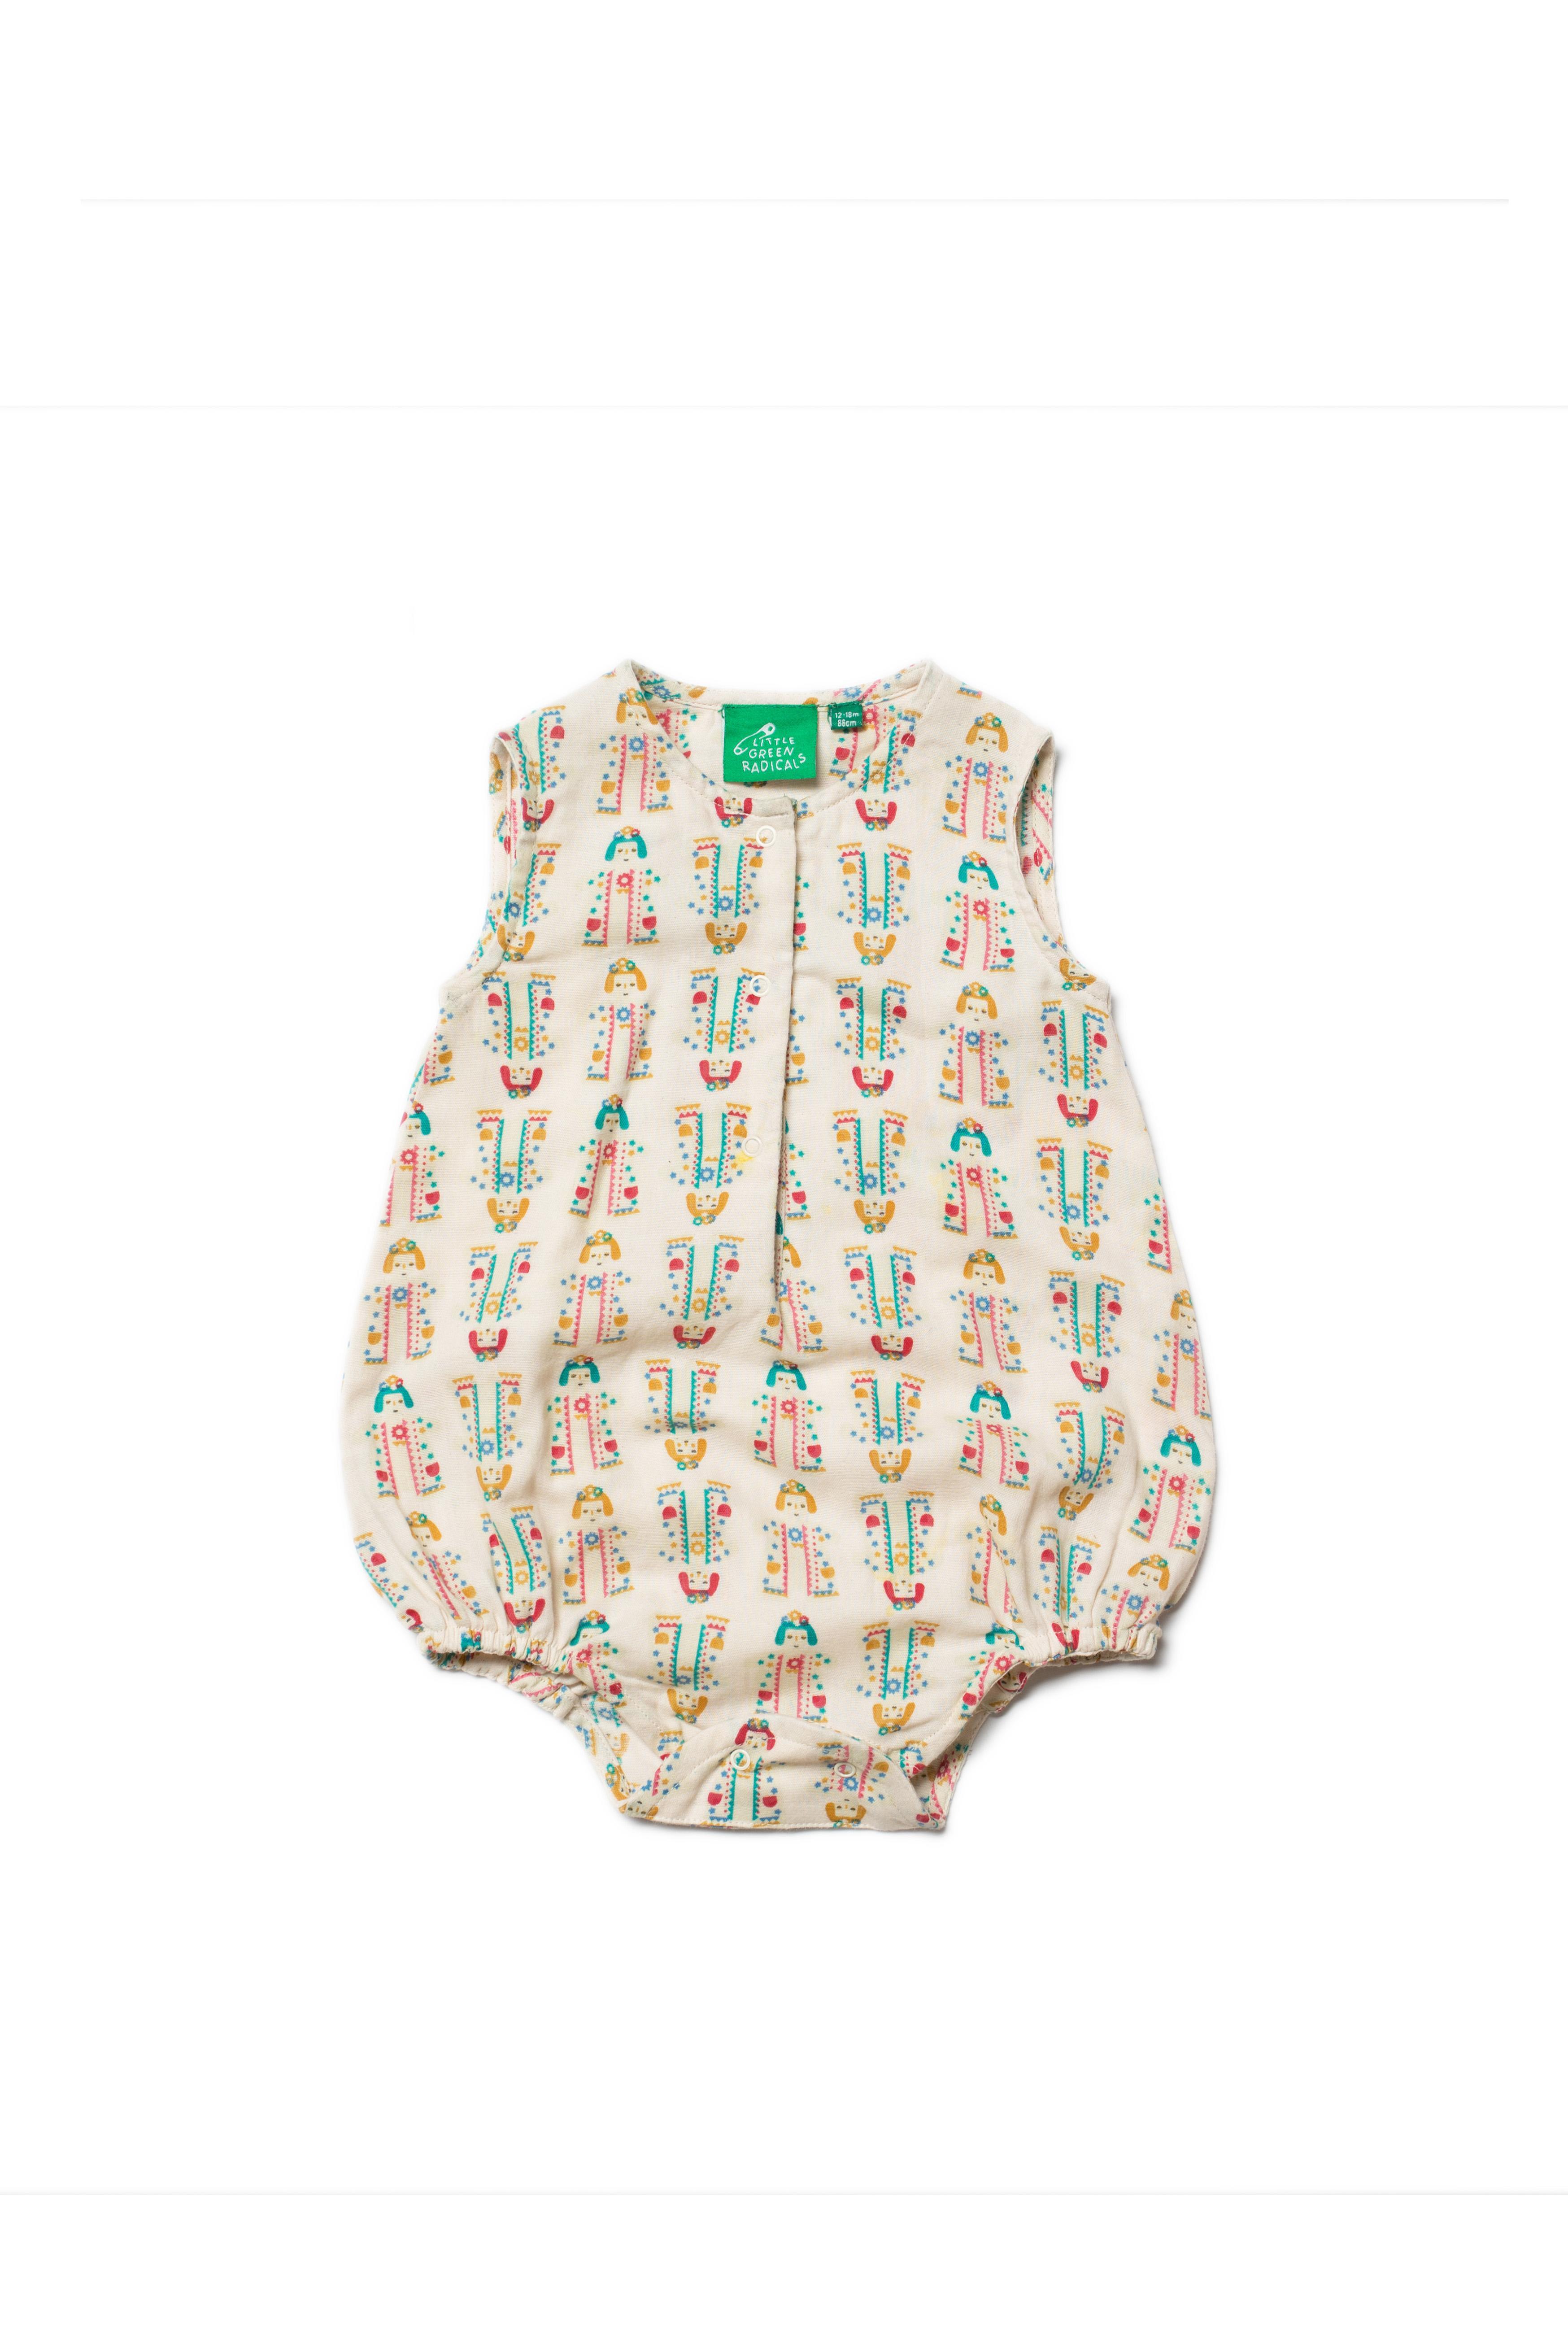 Little Green Radicals Babygrow 0 3 6 9 12 18 sleepsuit all in one Organic LGR